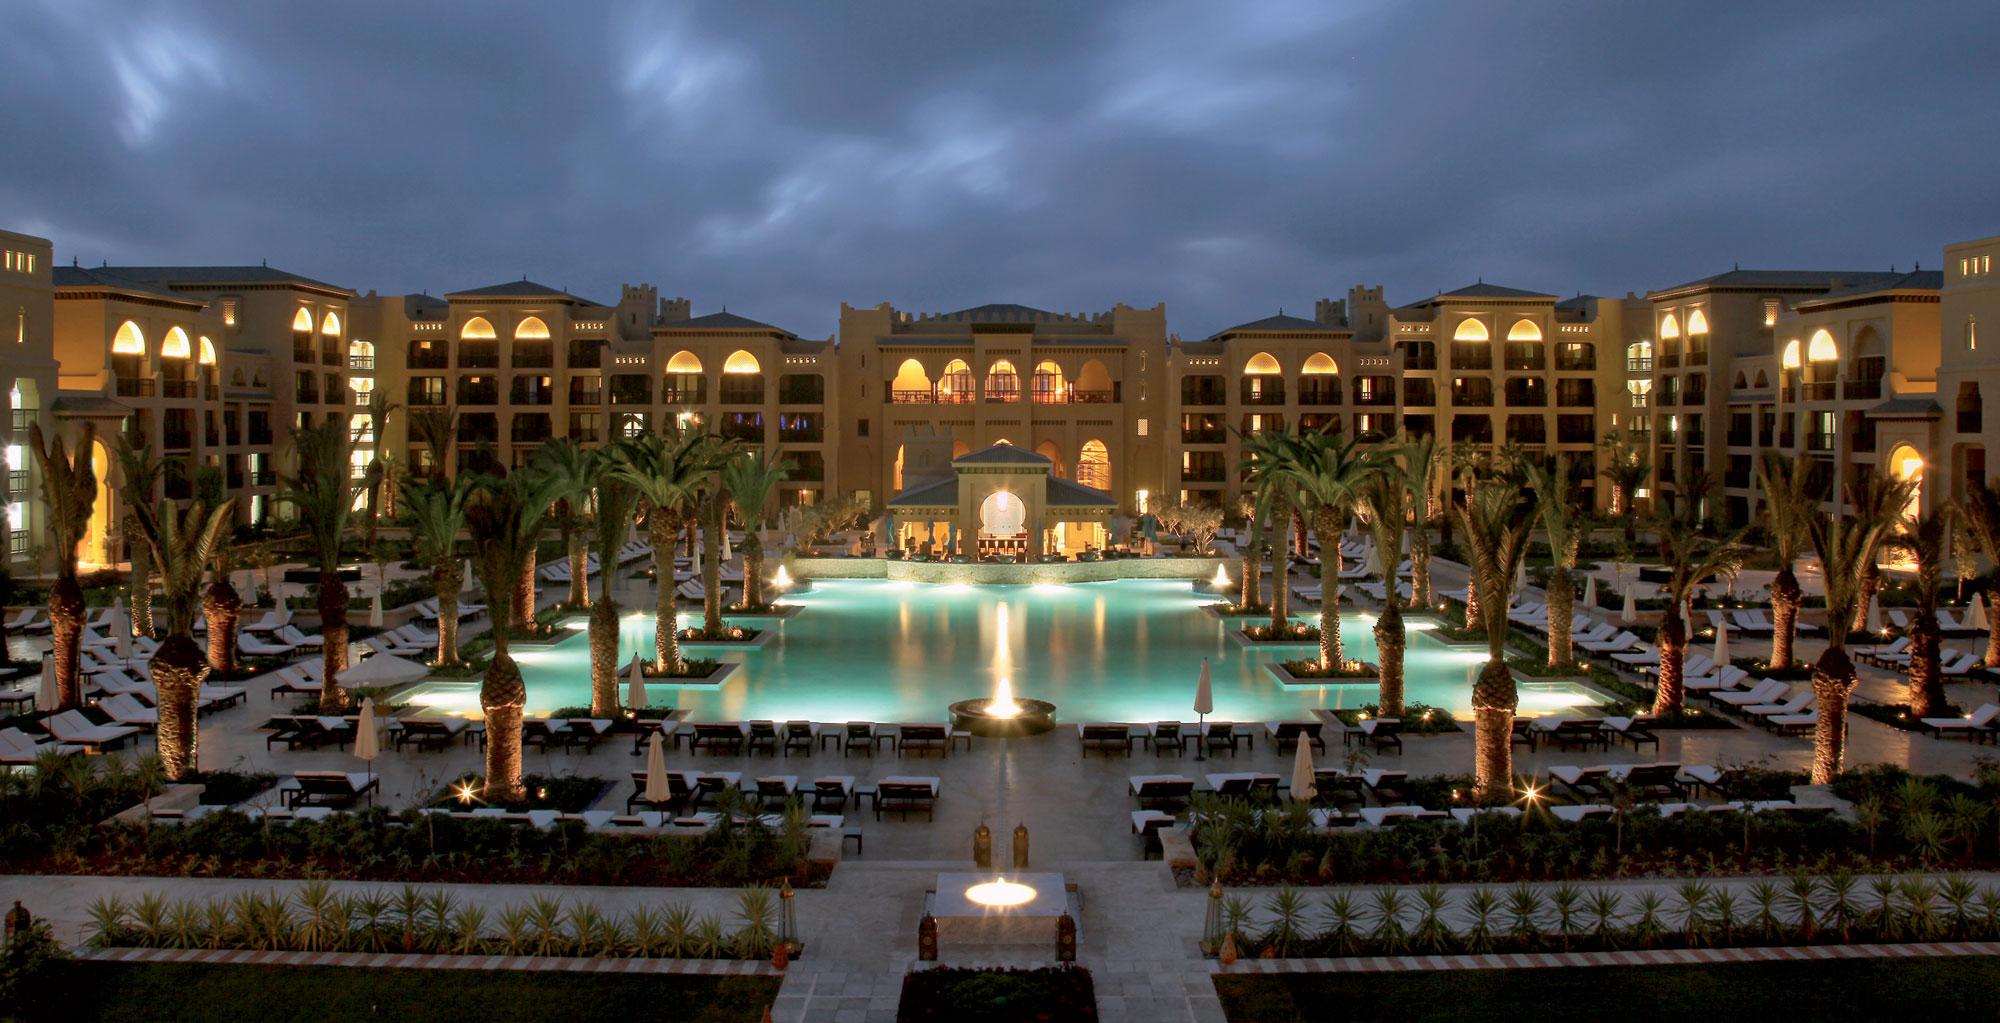 Hotel Luxe Bresil